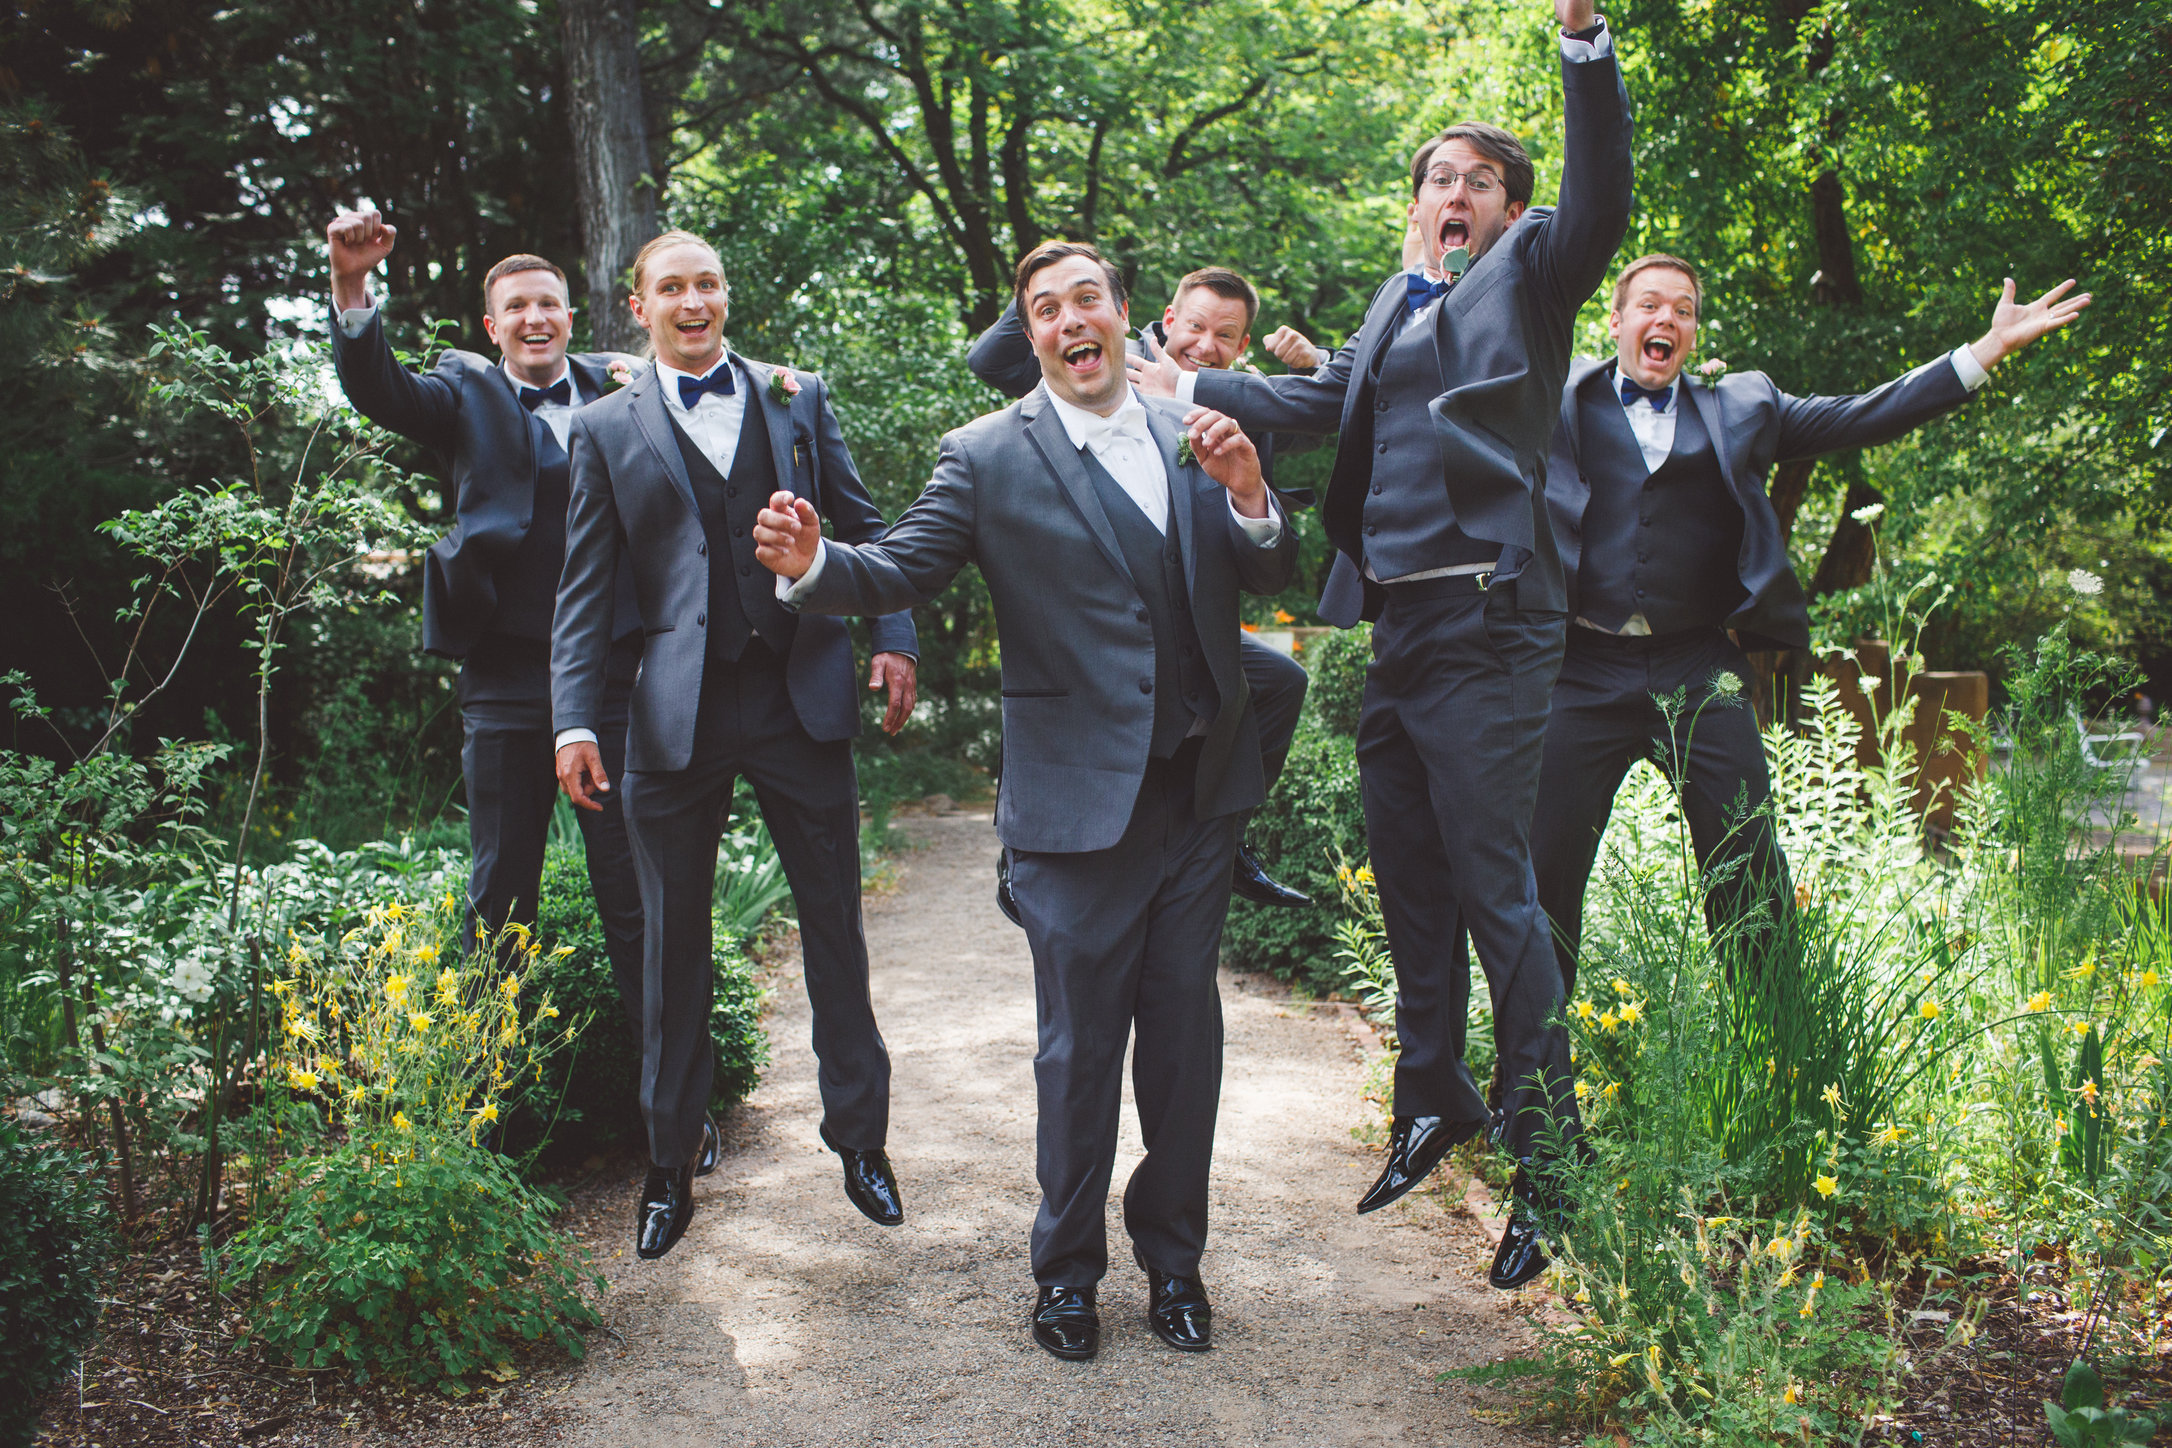 SandC-wedding-359.jpg